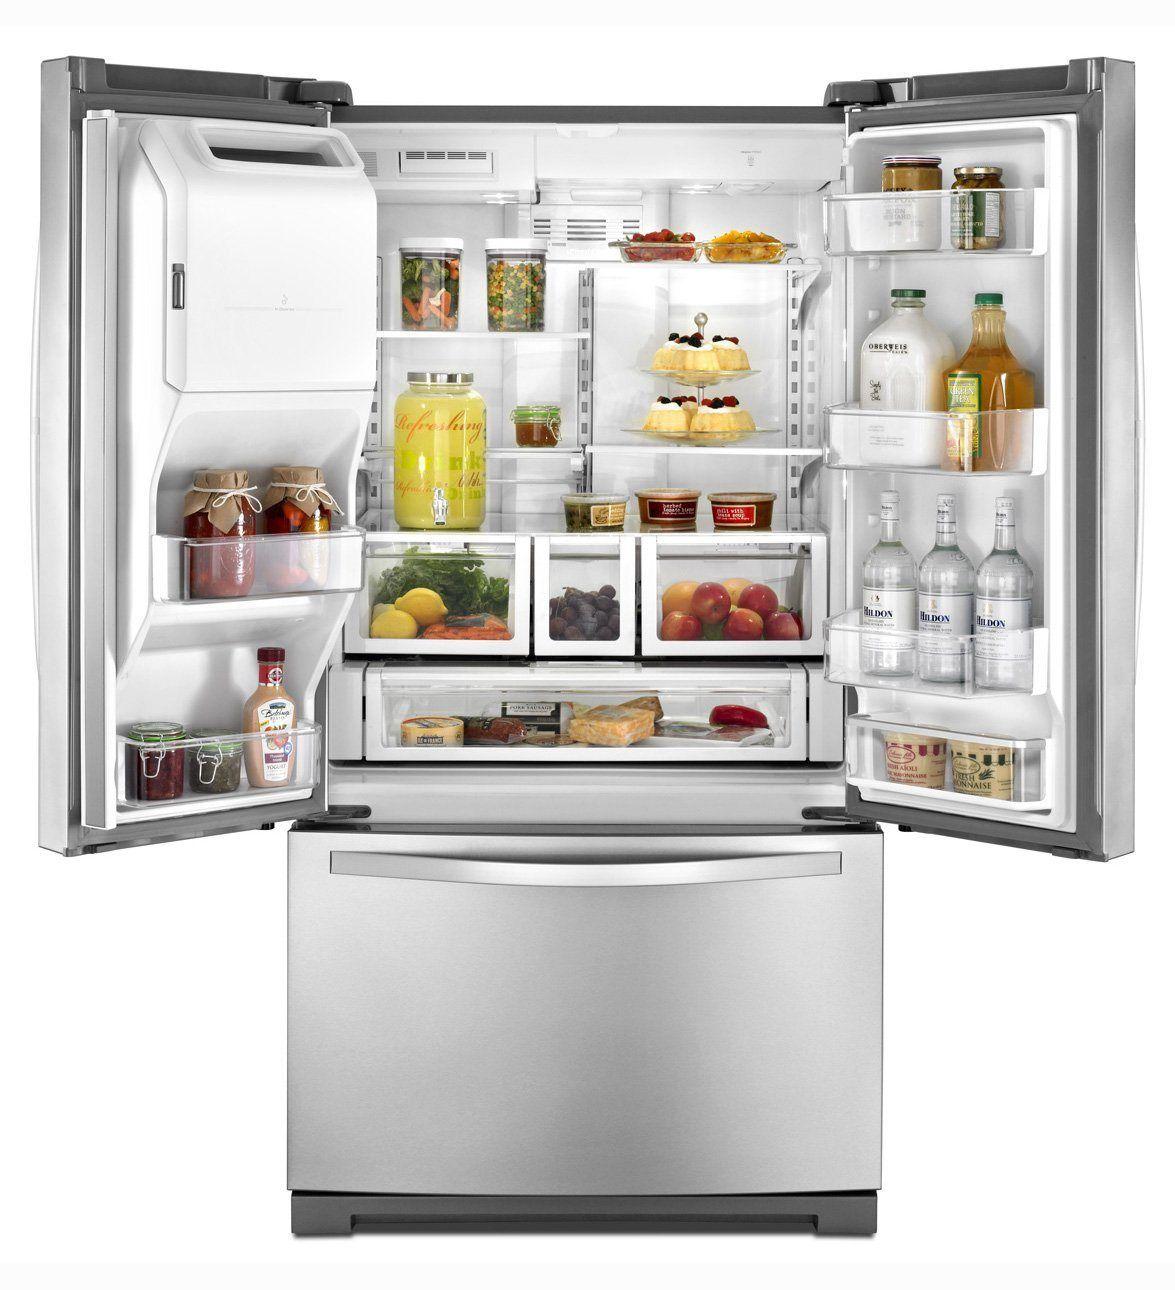 Top 10 Best Refrigerator Brands in 2015 Reviews Best